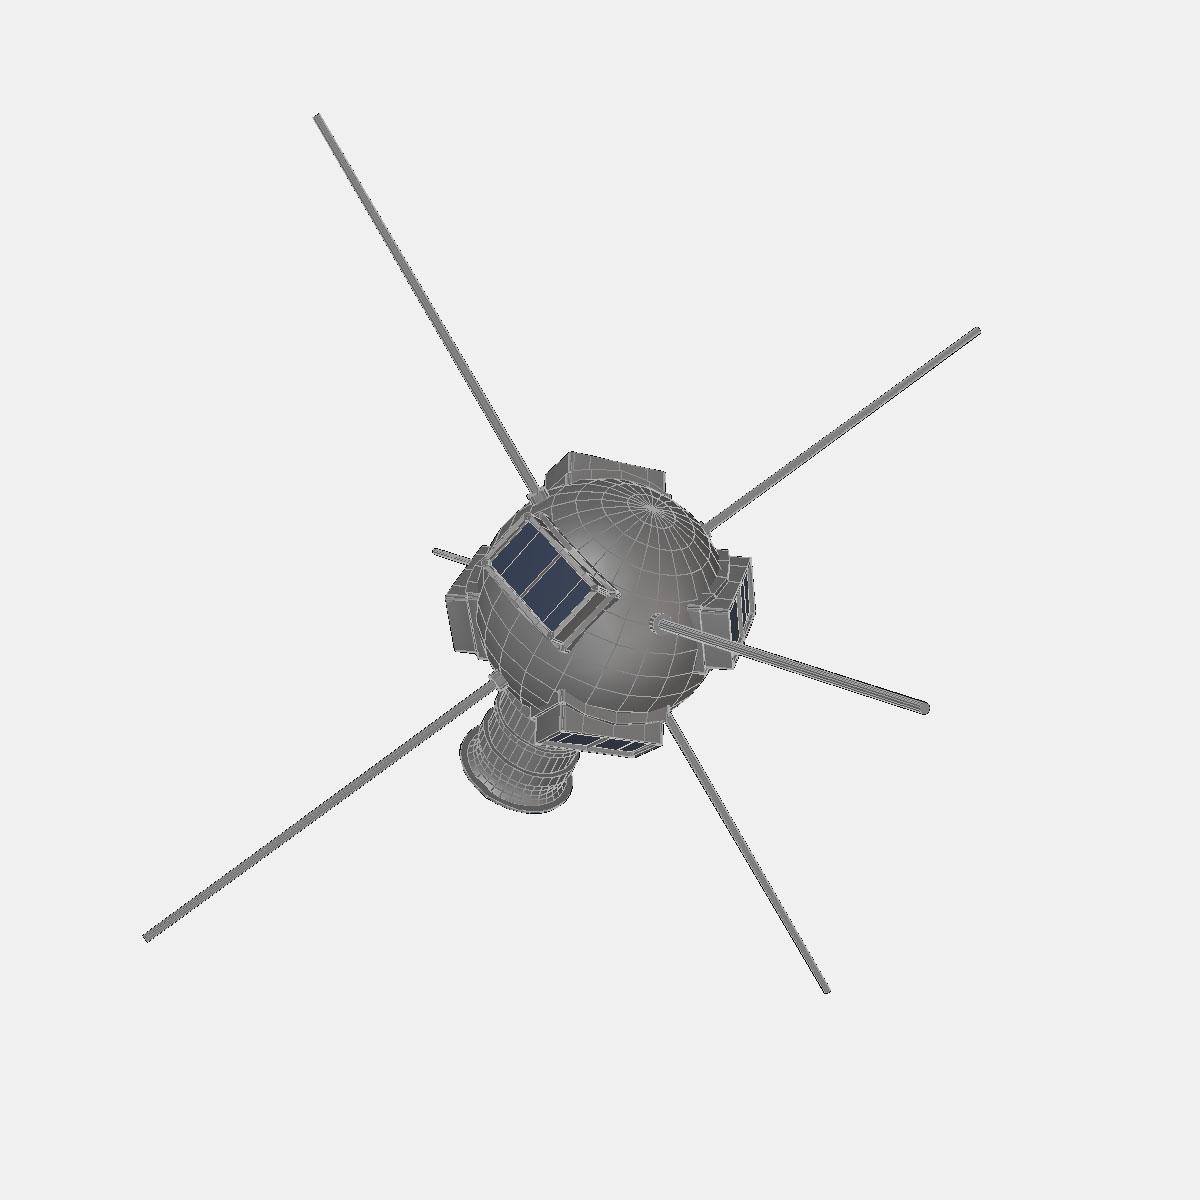 vanguard i satellite 3d model 3ds dxf fbx blend cob dae x obj 163931